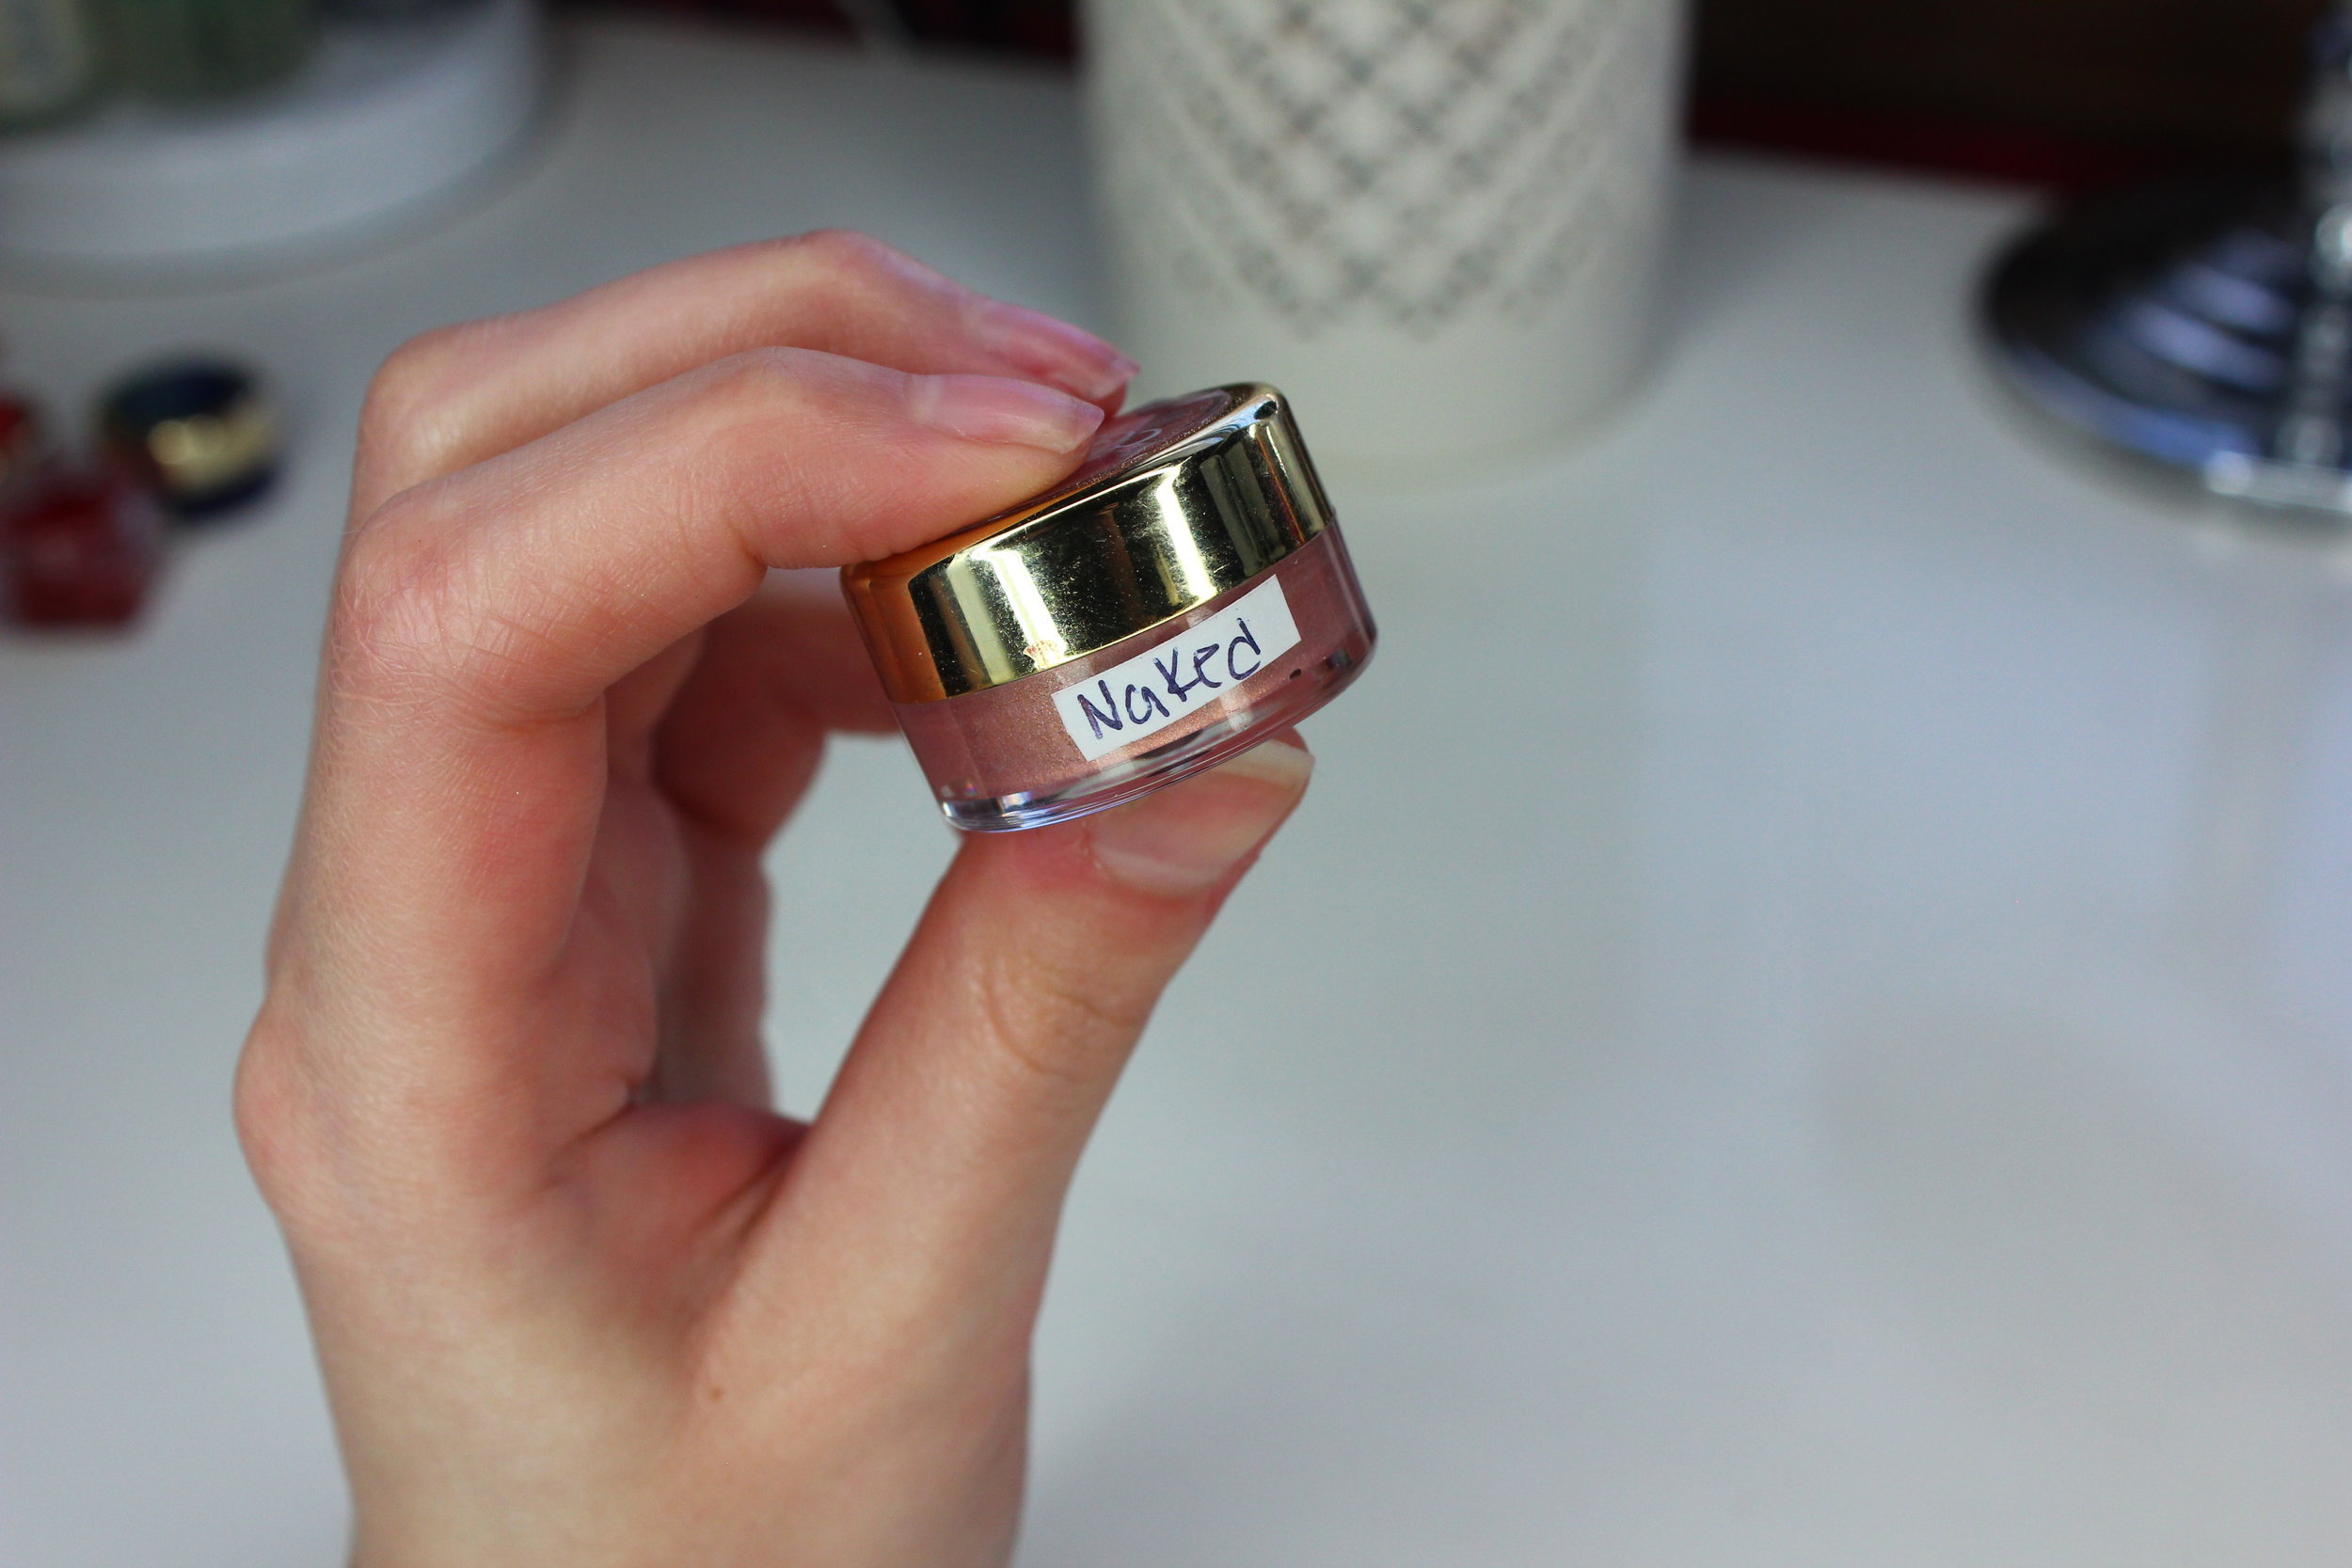 NIA Cosmetics - Naked 1